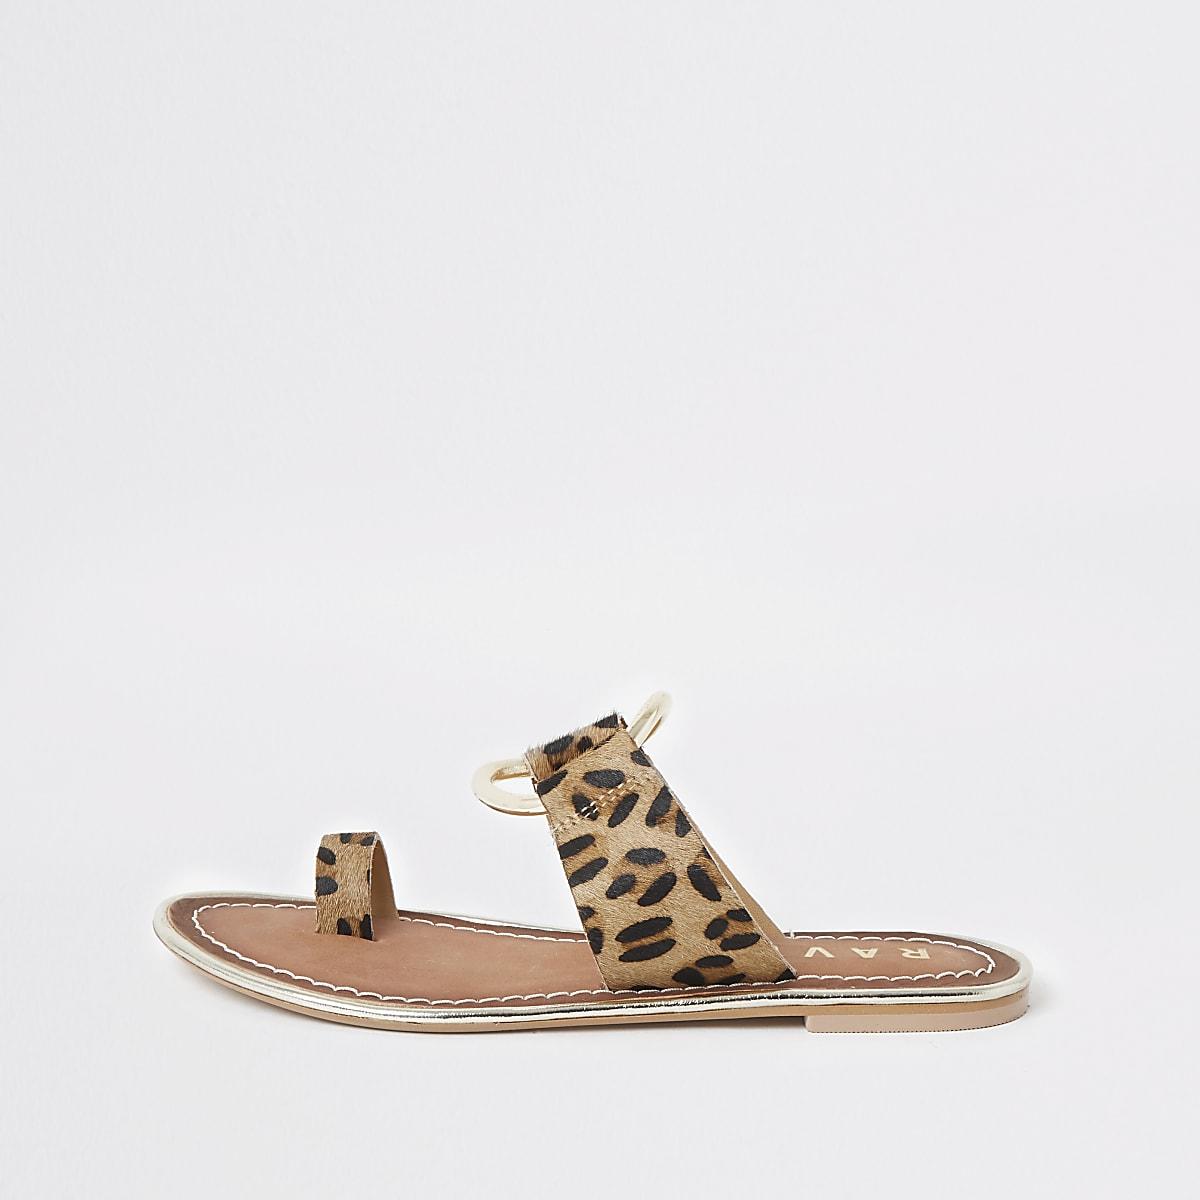 Ravel brown leopard print toe ring sandals